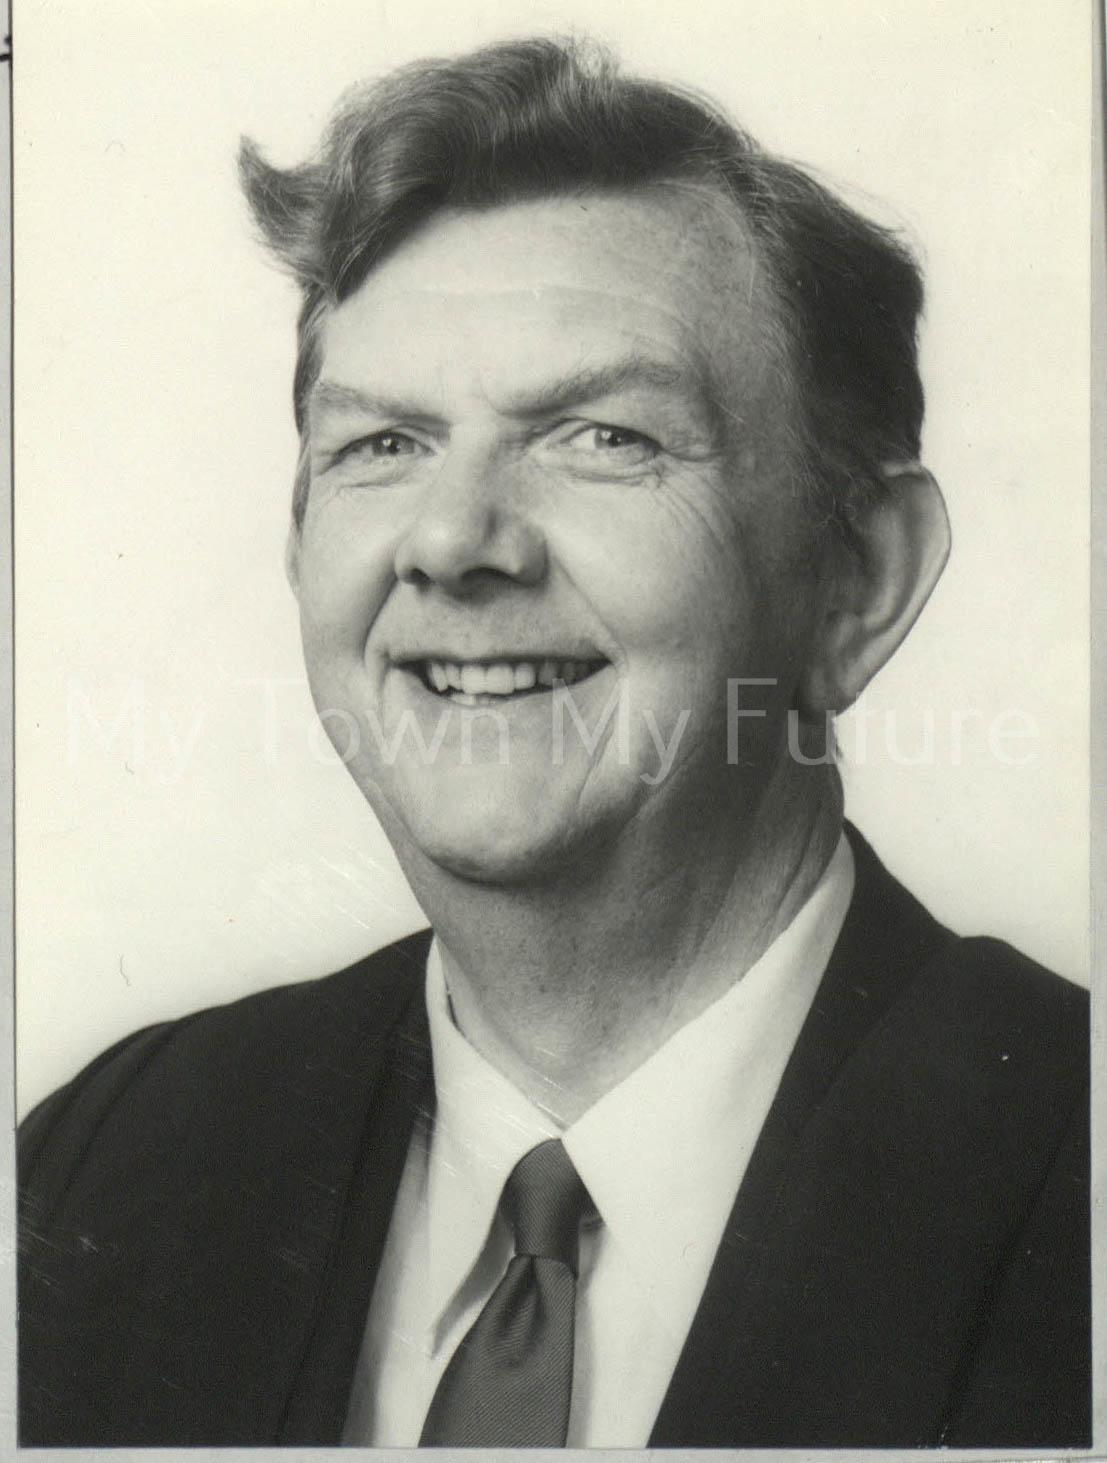 M England Headmaster Red House School Stockton 1982